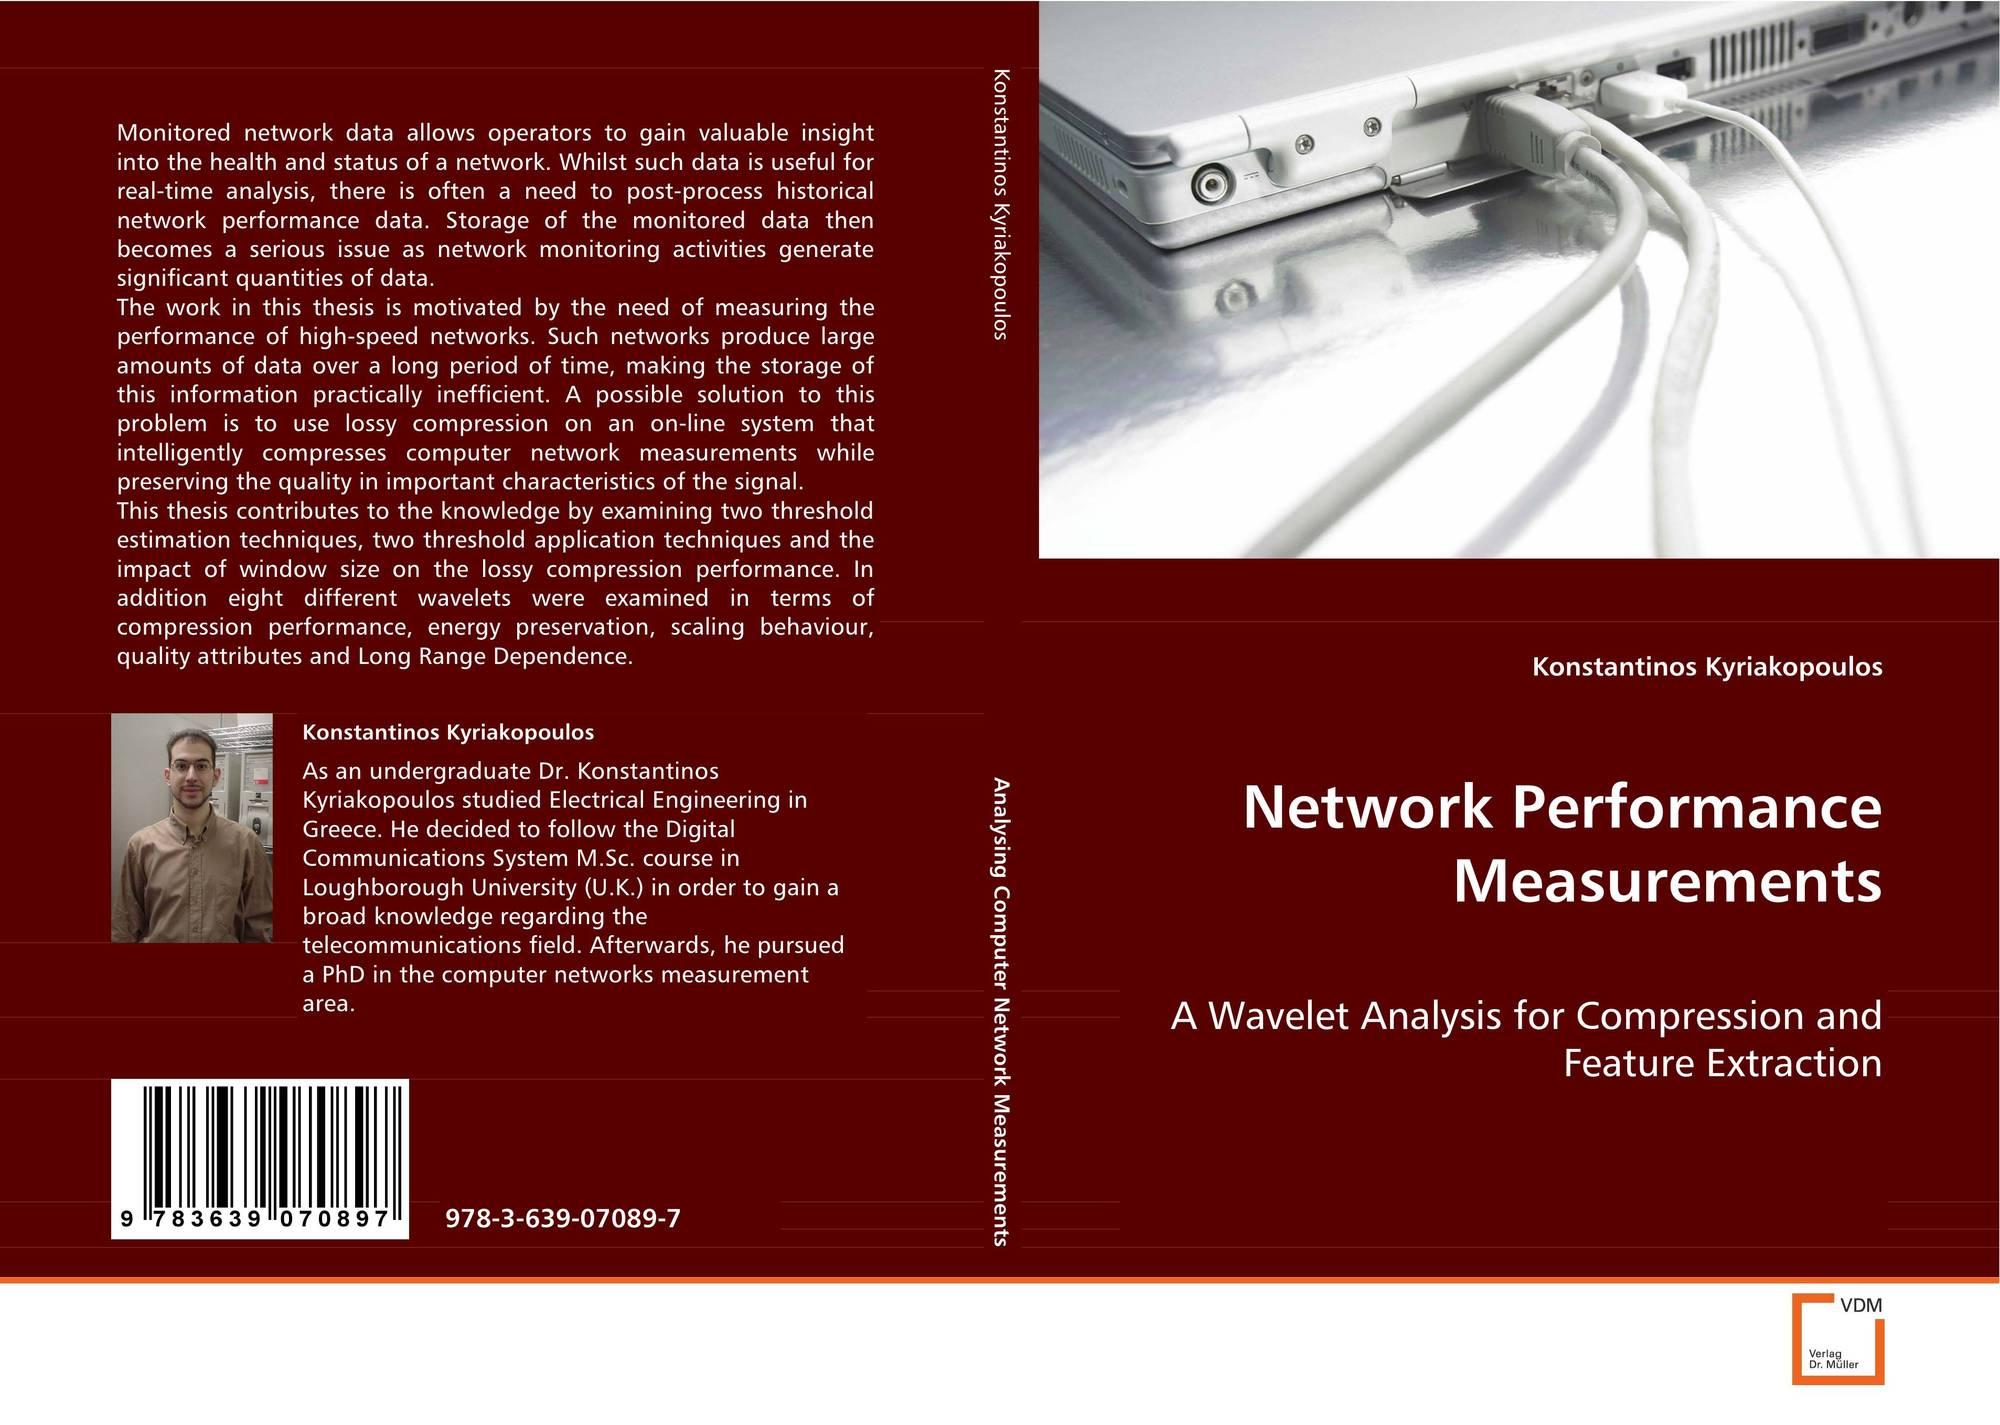 Network Performance Measurements, 978-3-639-07089-7